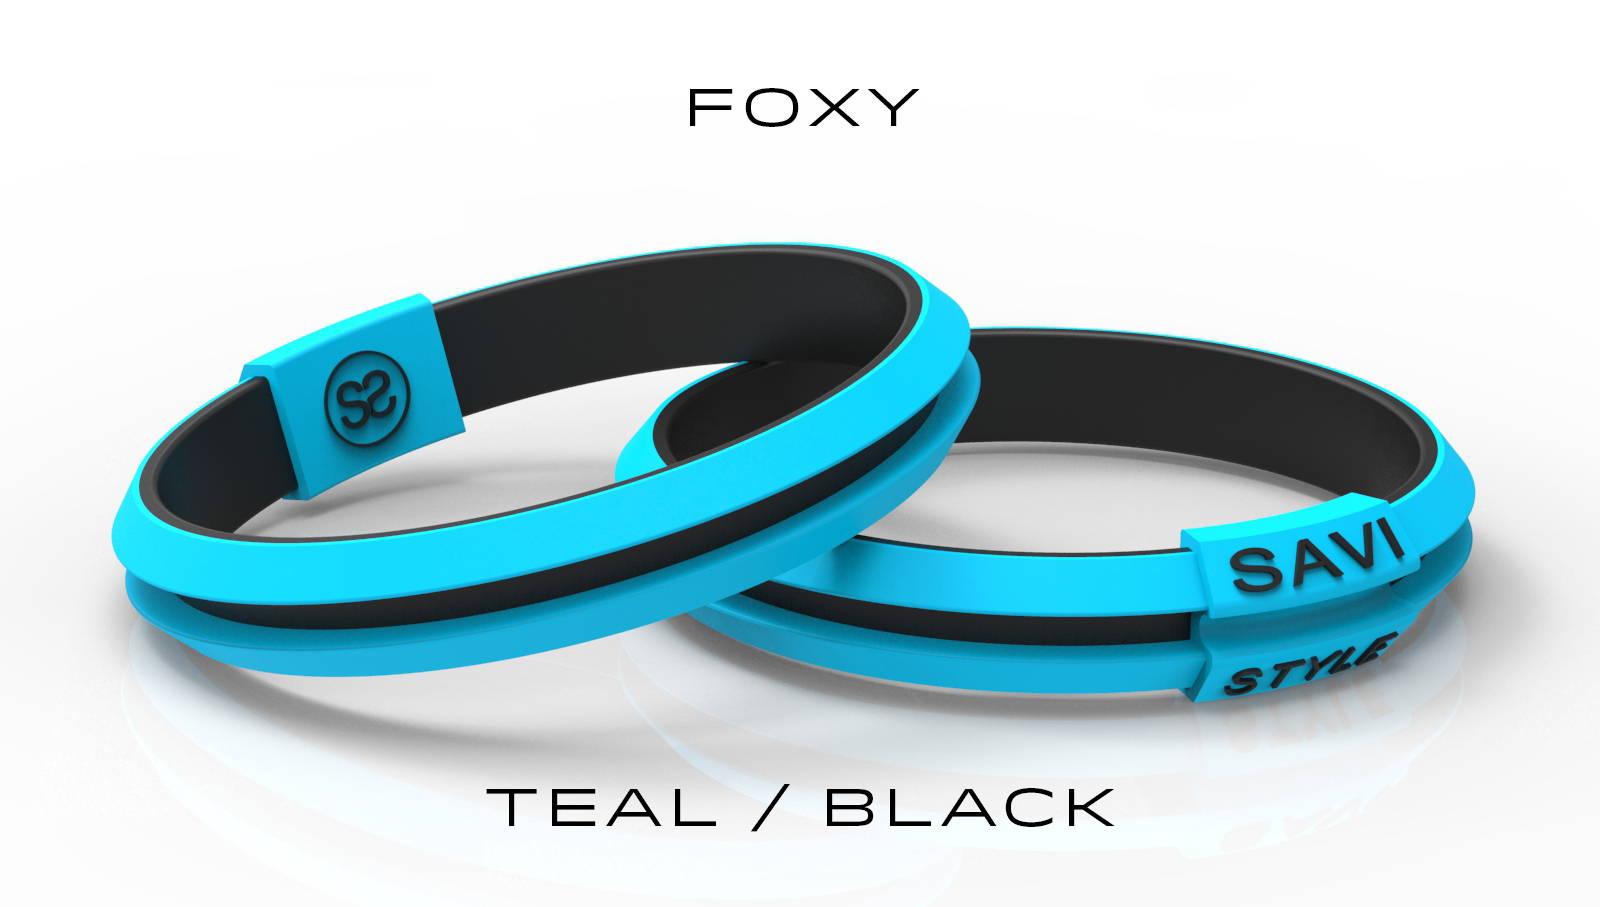 savi sleek by savistyle hair tie bracelet Foxy Teal